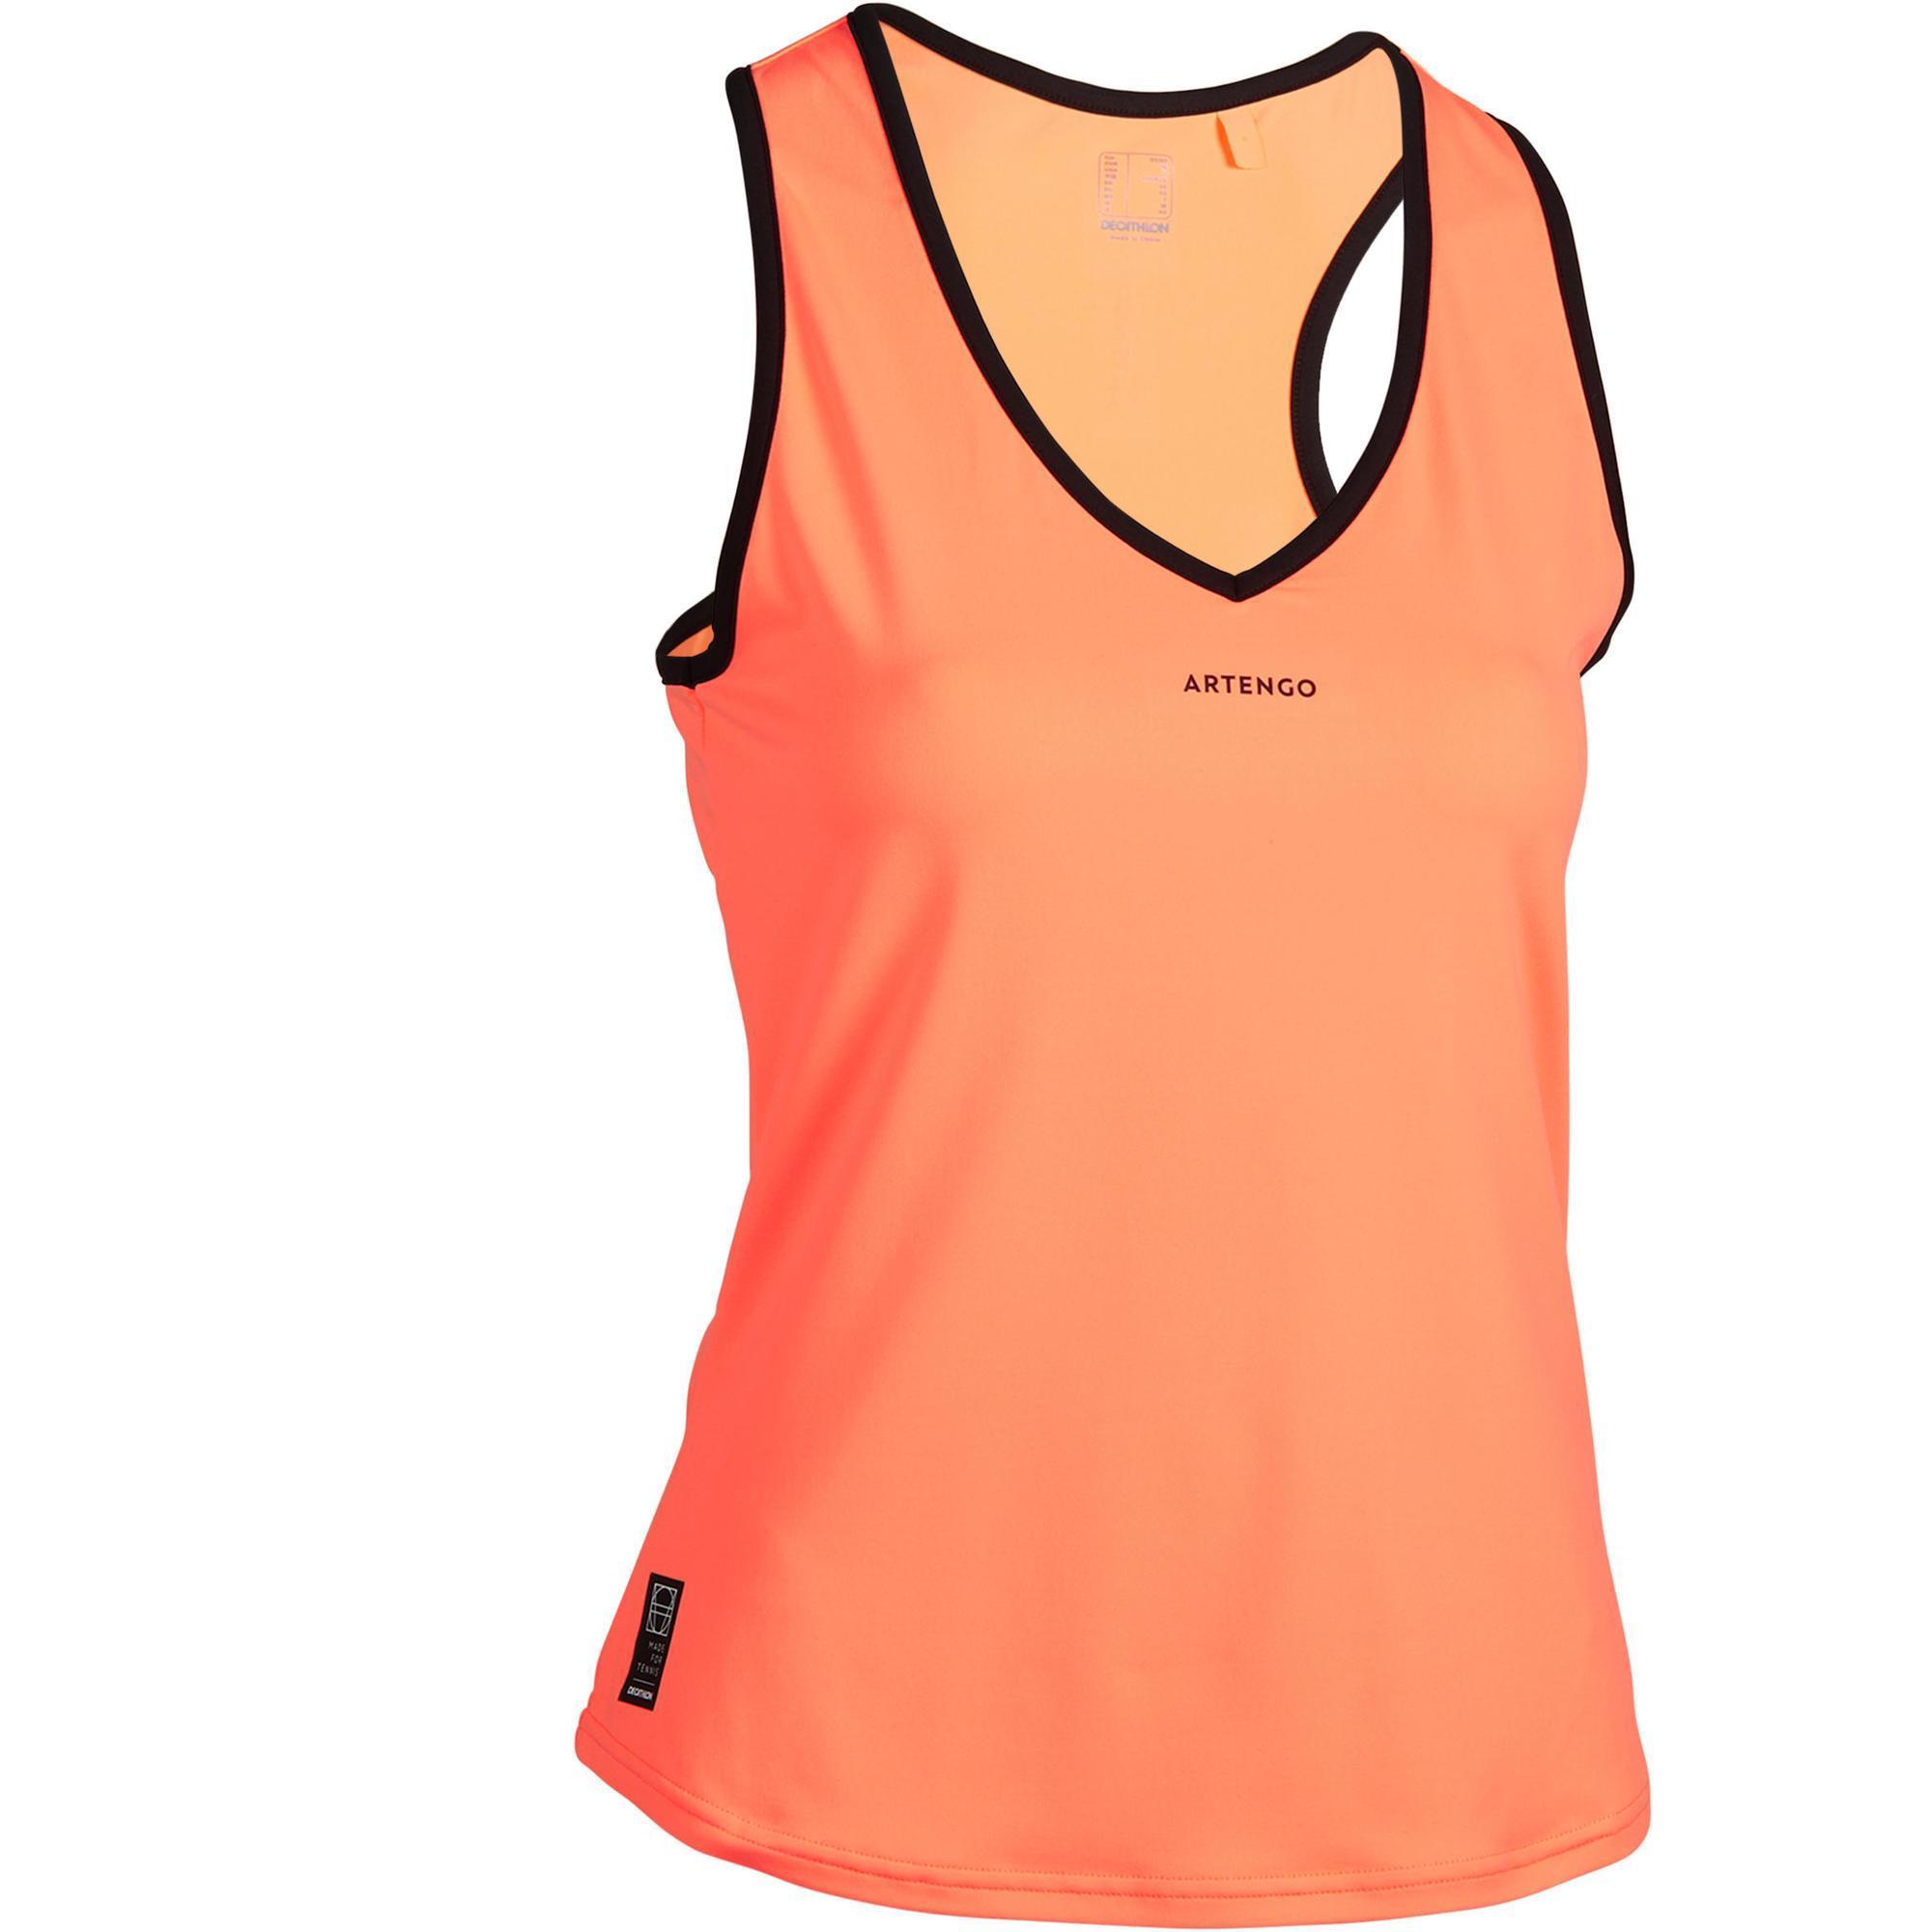 Tennis-Top TK Light 900 Damen orange   Sportbekleidung > Sporttops > Tennistops   Artengo